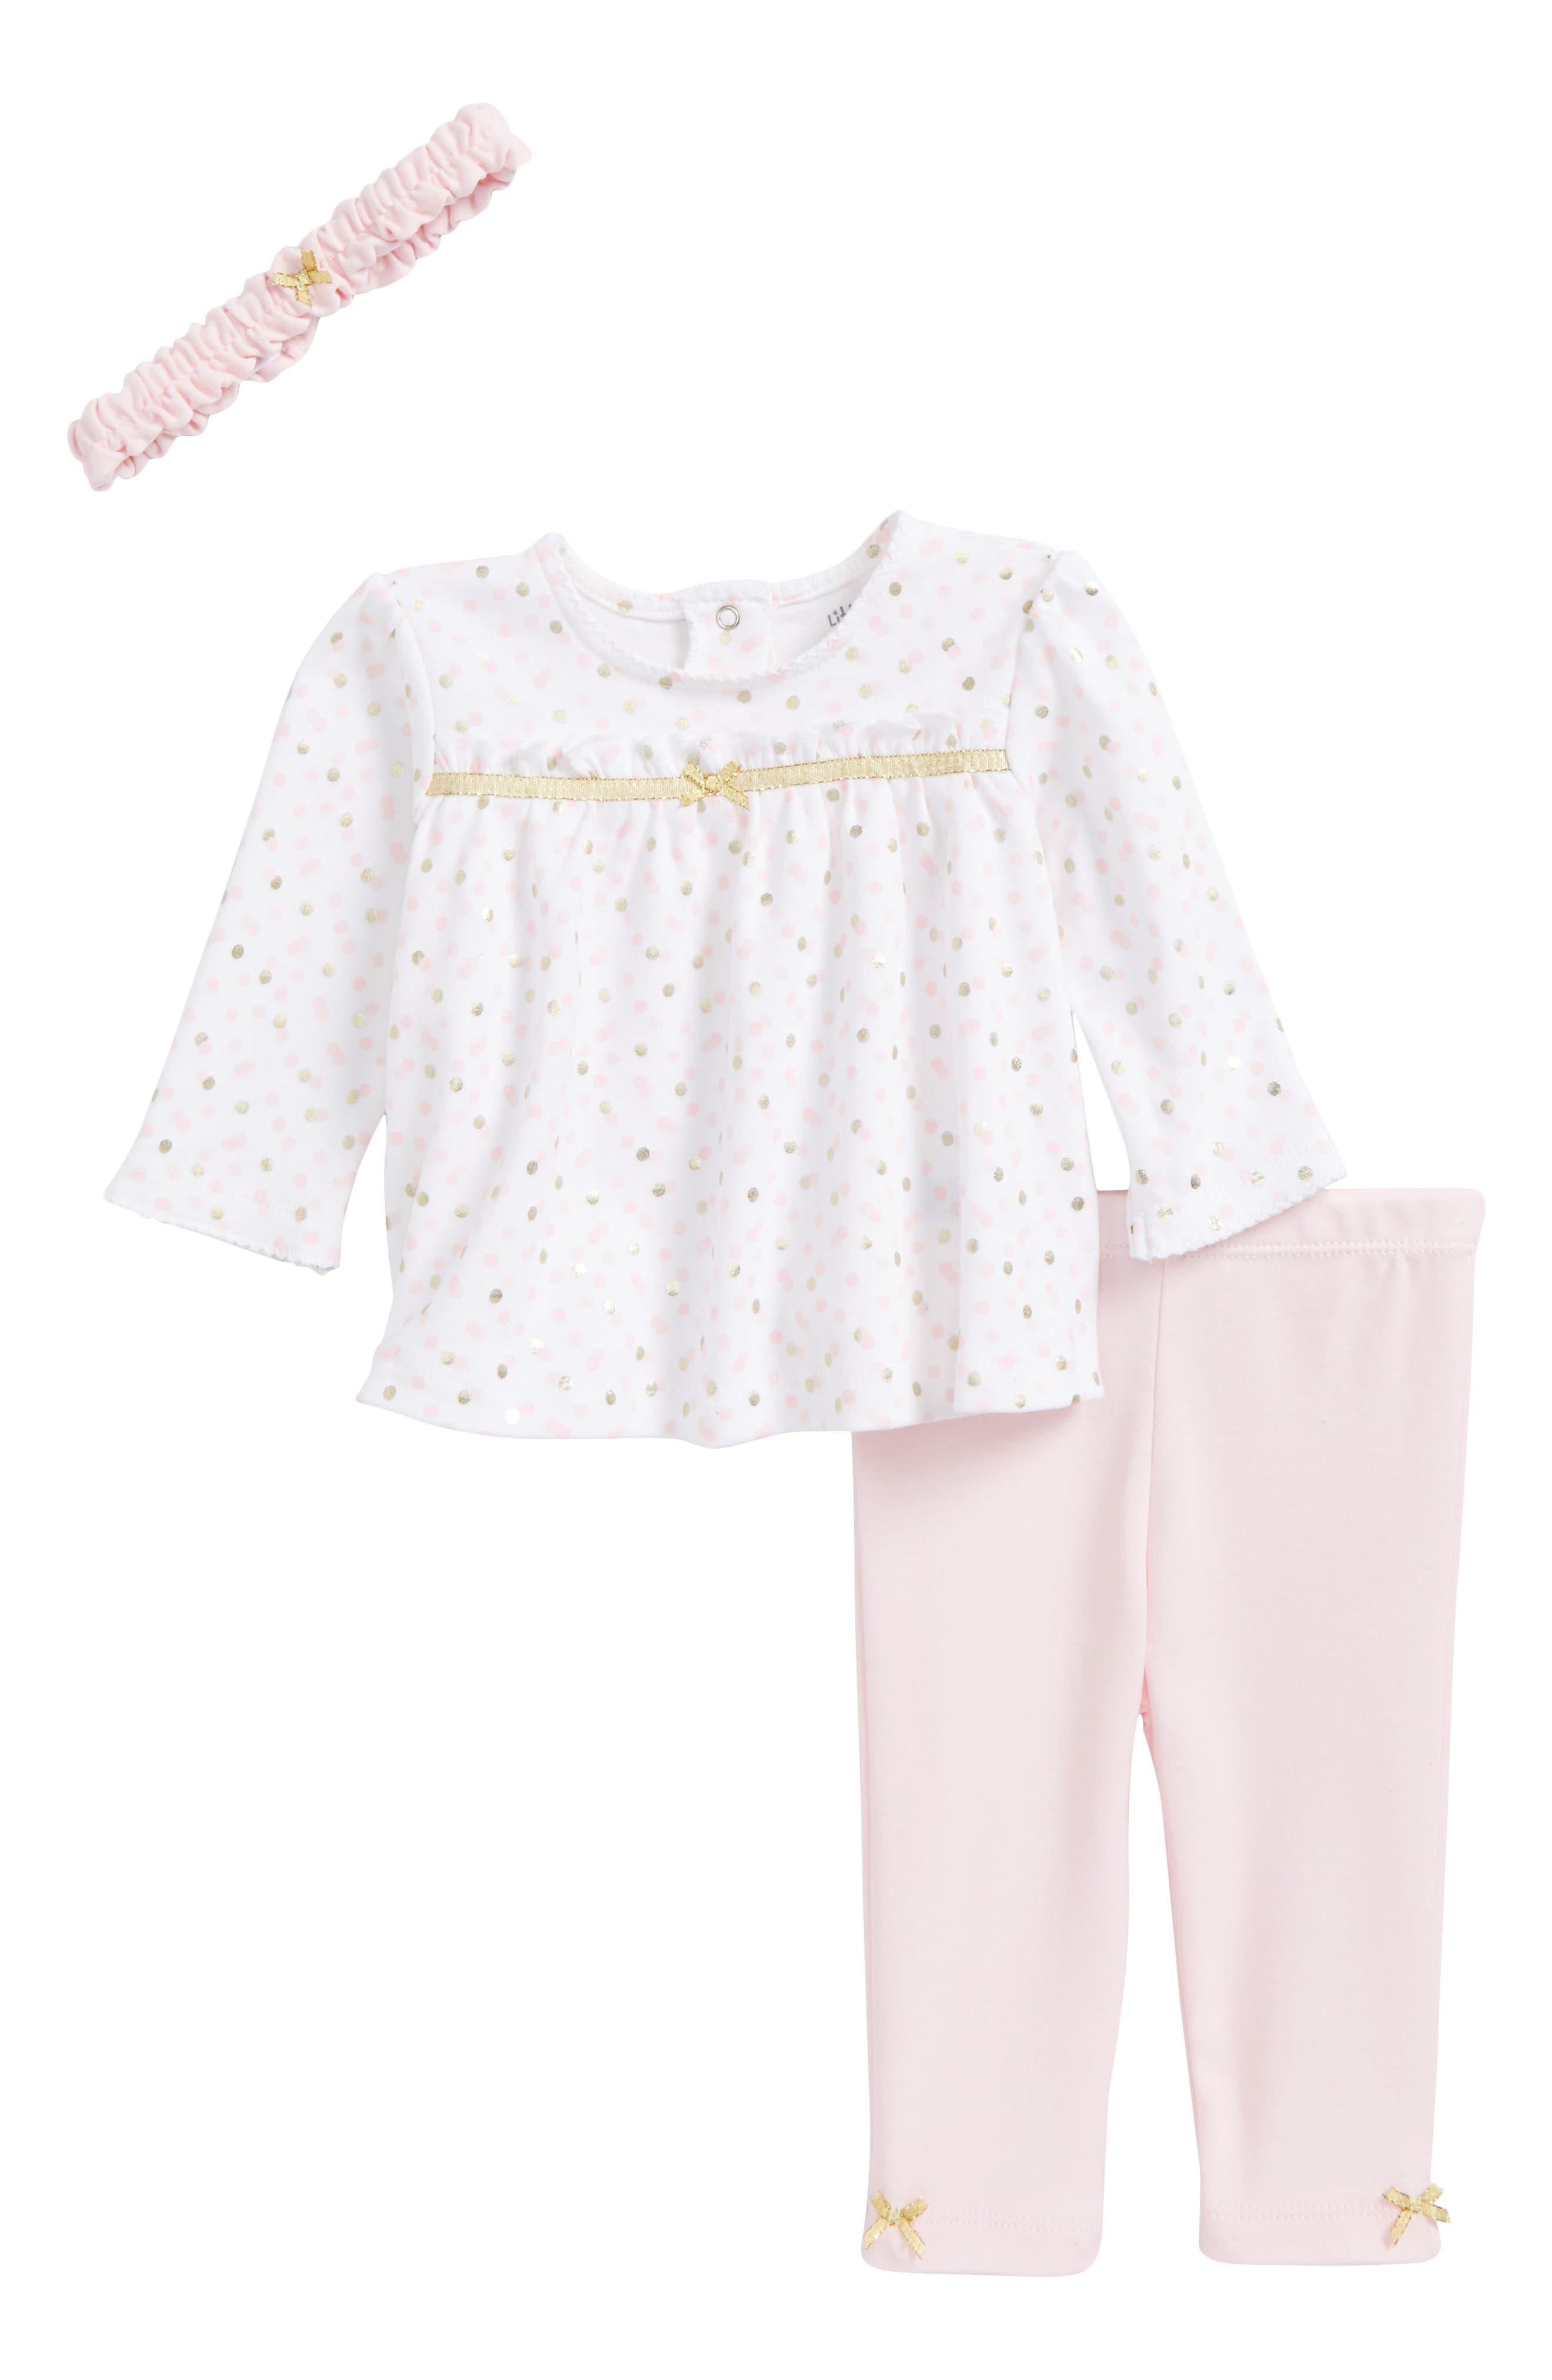 Shimmer Dot Tunic, Leggings & Headband Set,                         Main,                         color, Pink